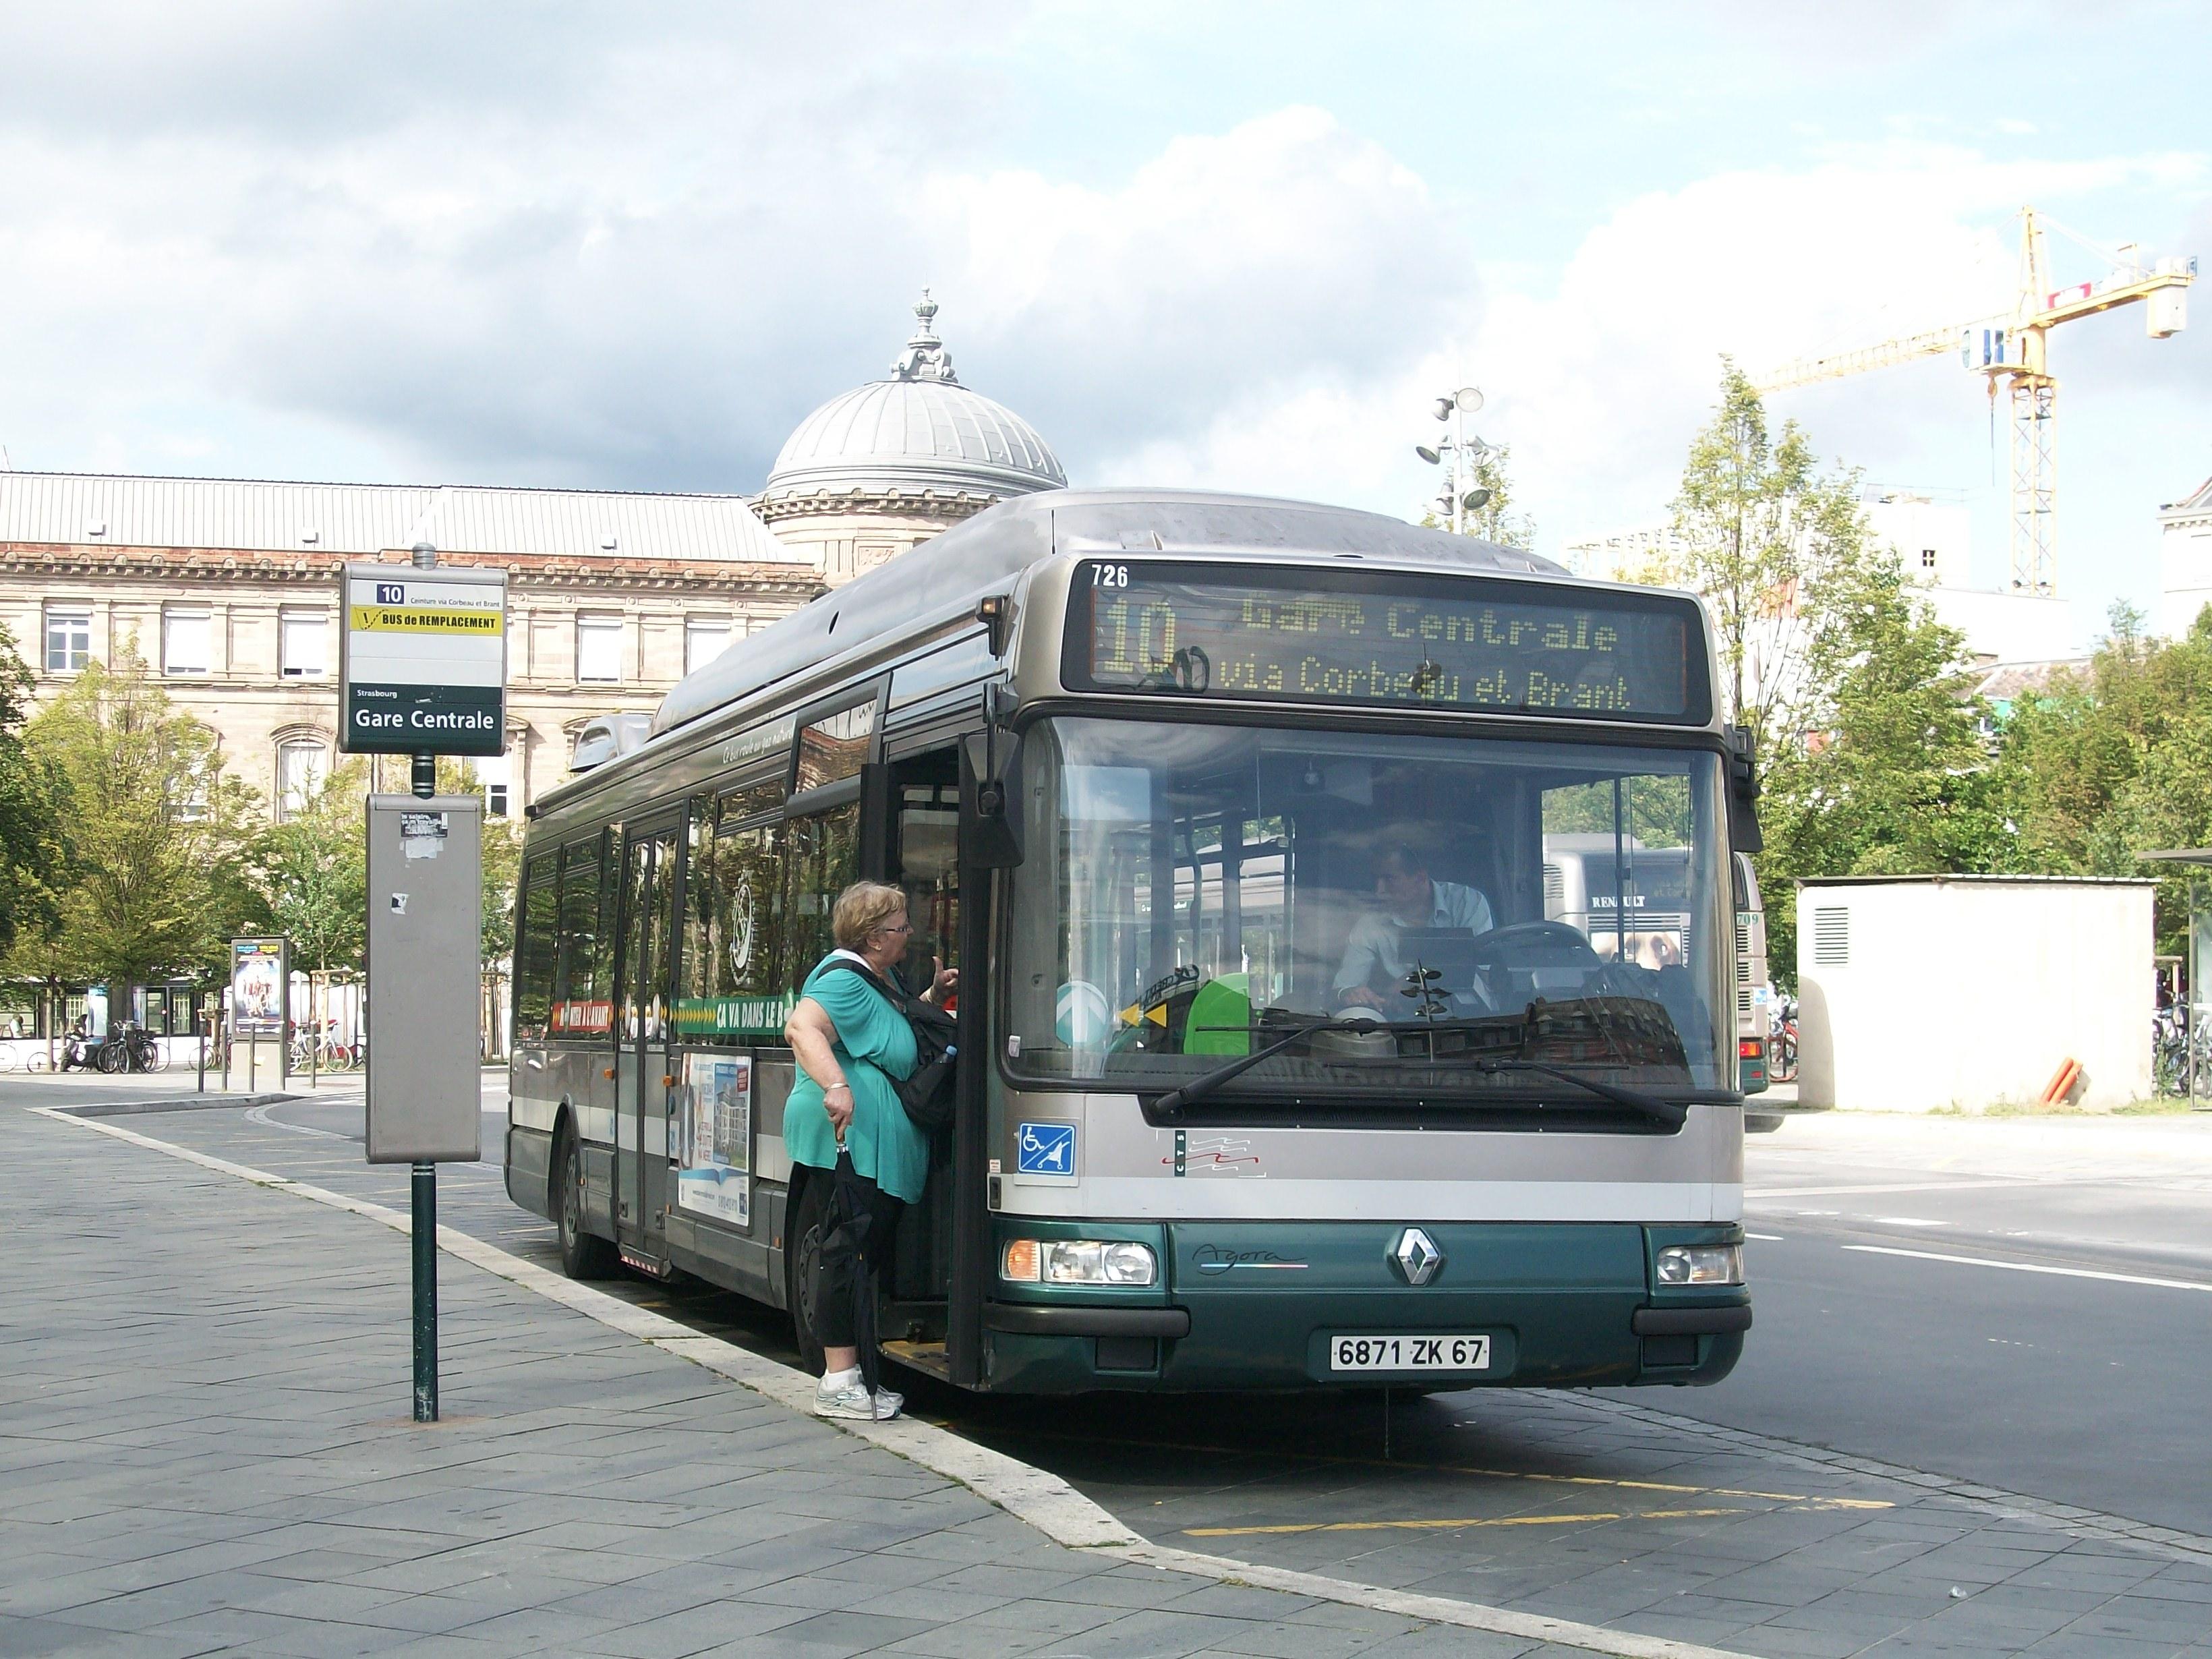 file renault agora s gnv bus 10 strasbourg 2012 jpg wikimedia commons. Black Bedroom Furniture Sets. Home Design Ideas